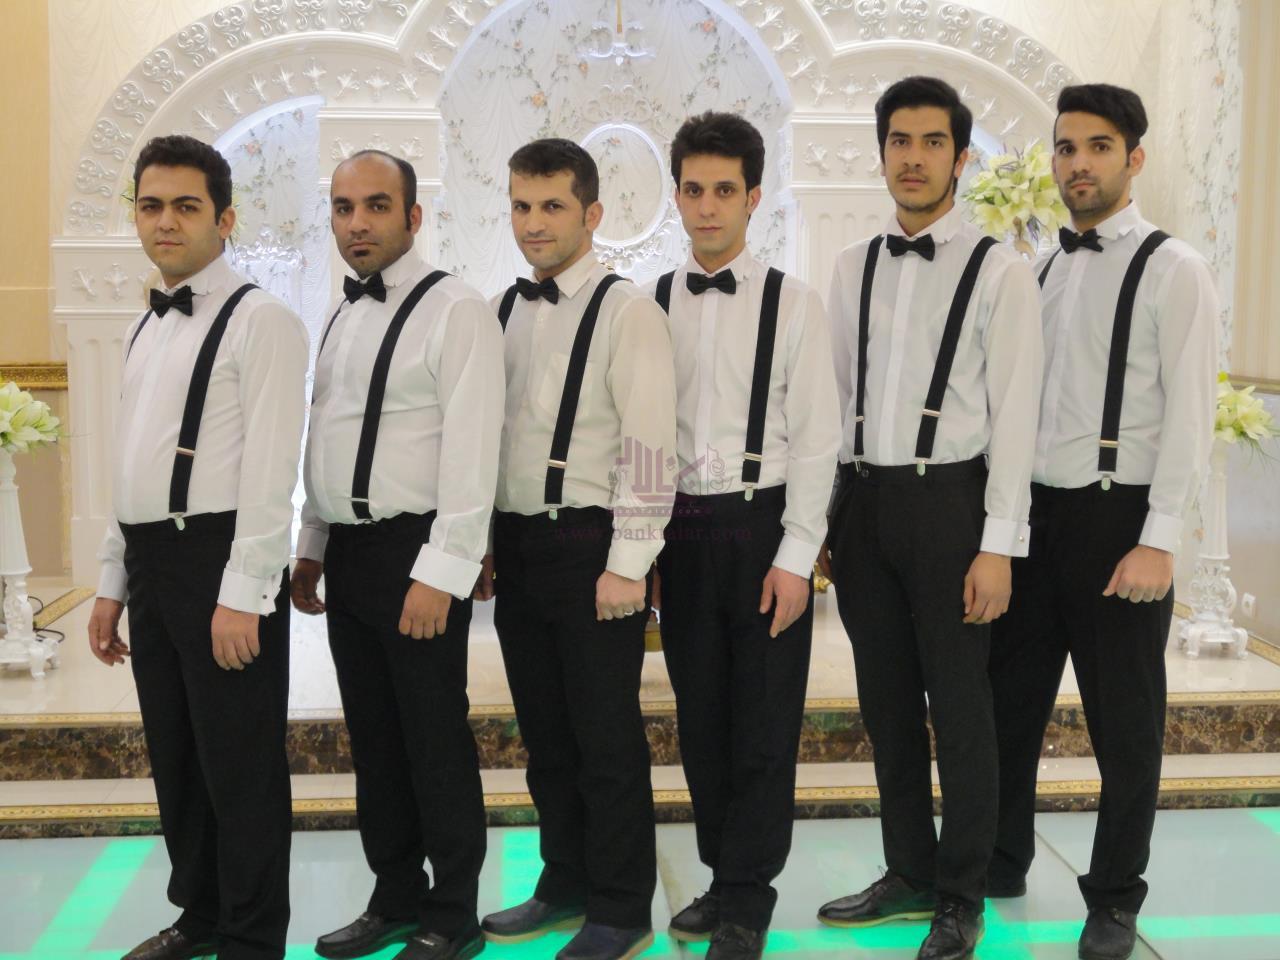 سعید ام دی اف کارگیلانی لباس-پرسنل-تالار